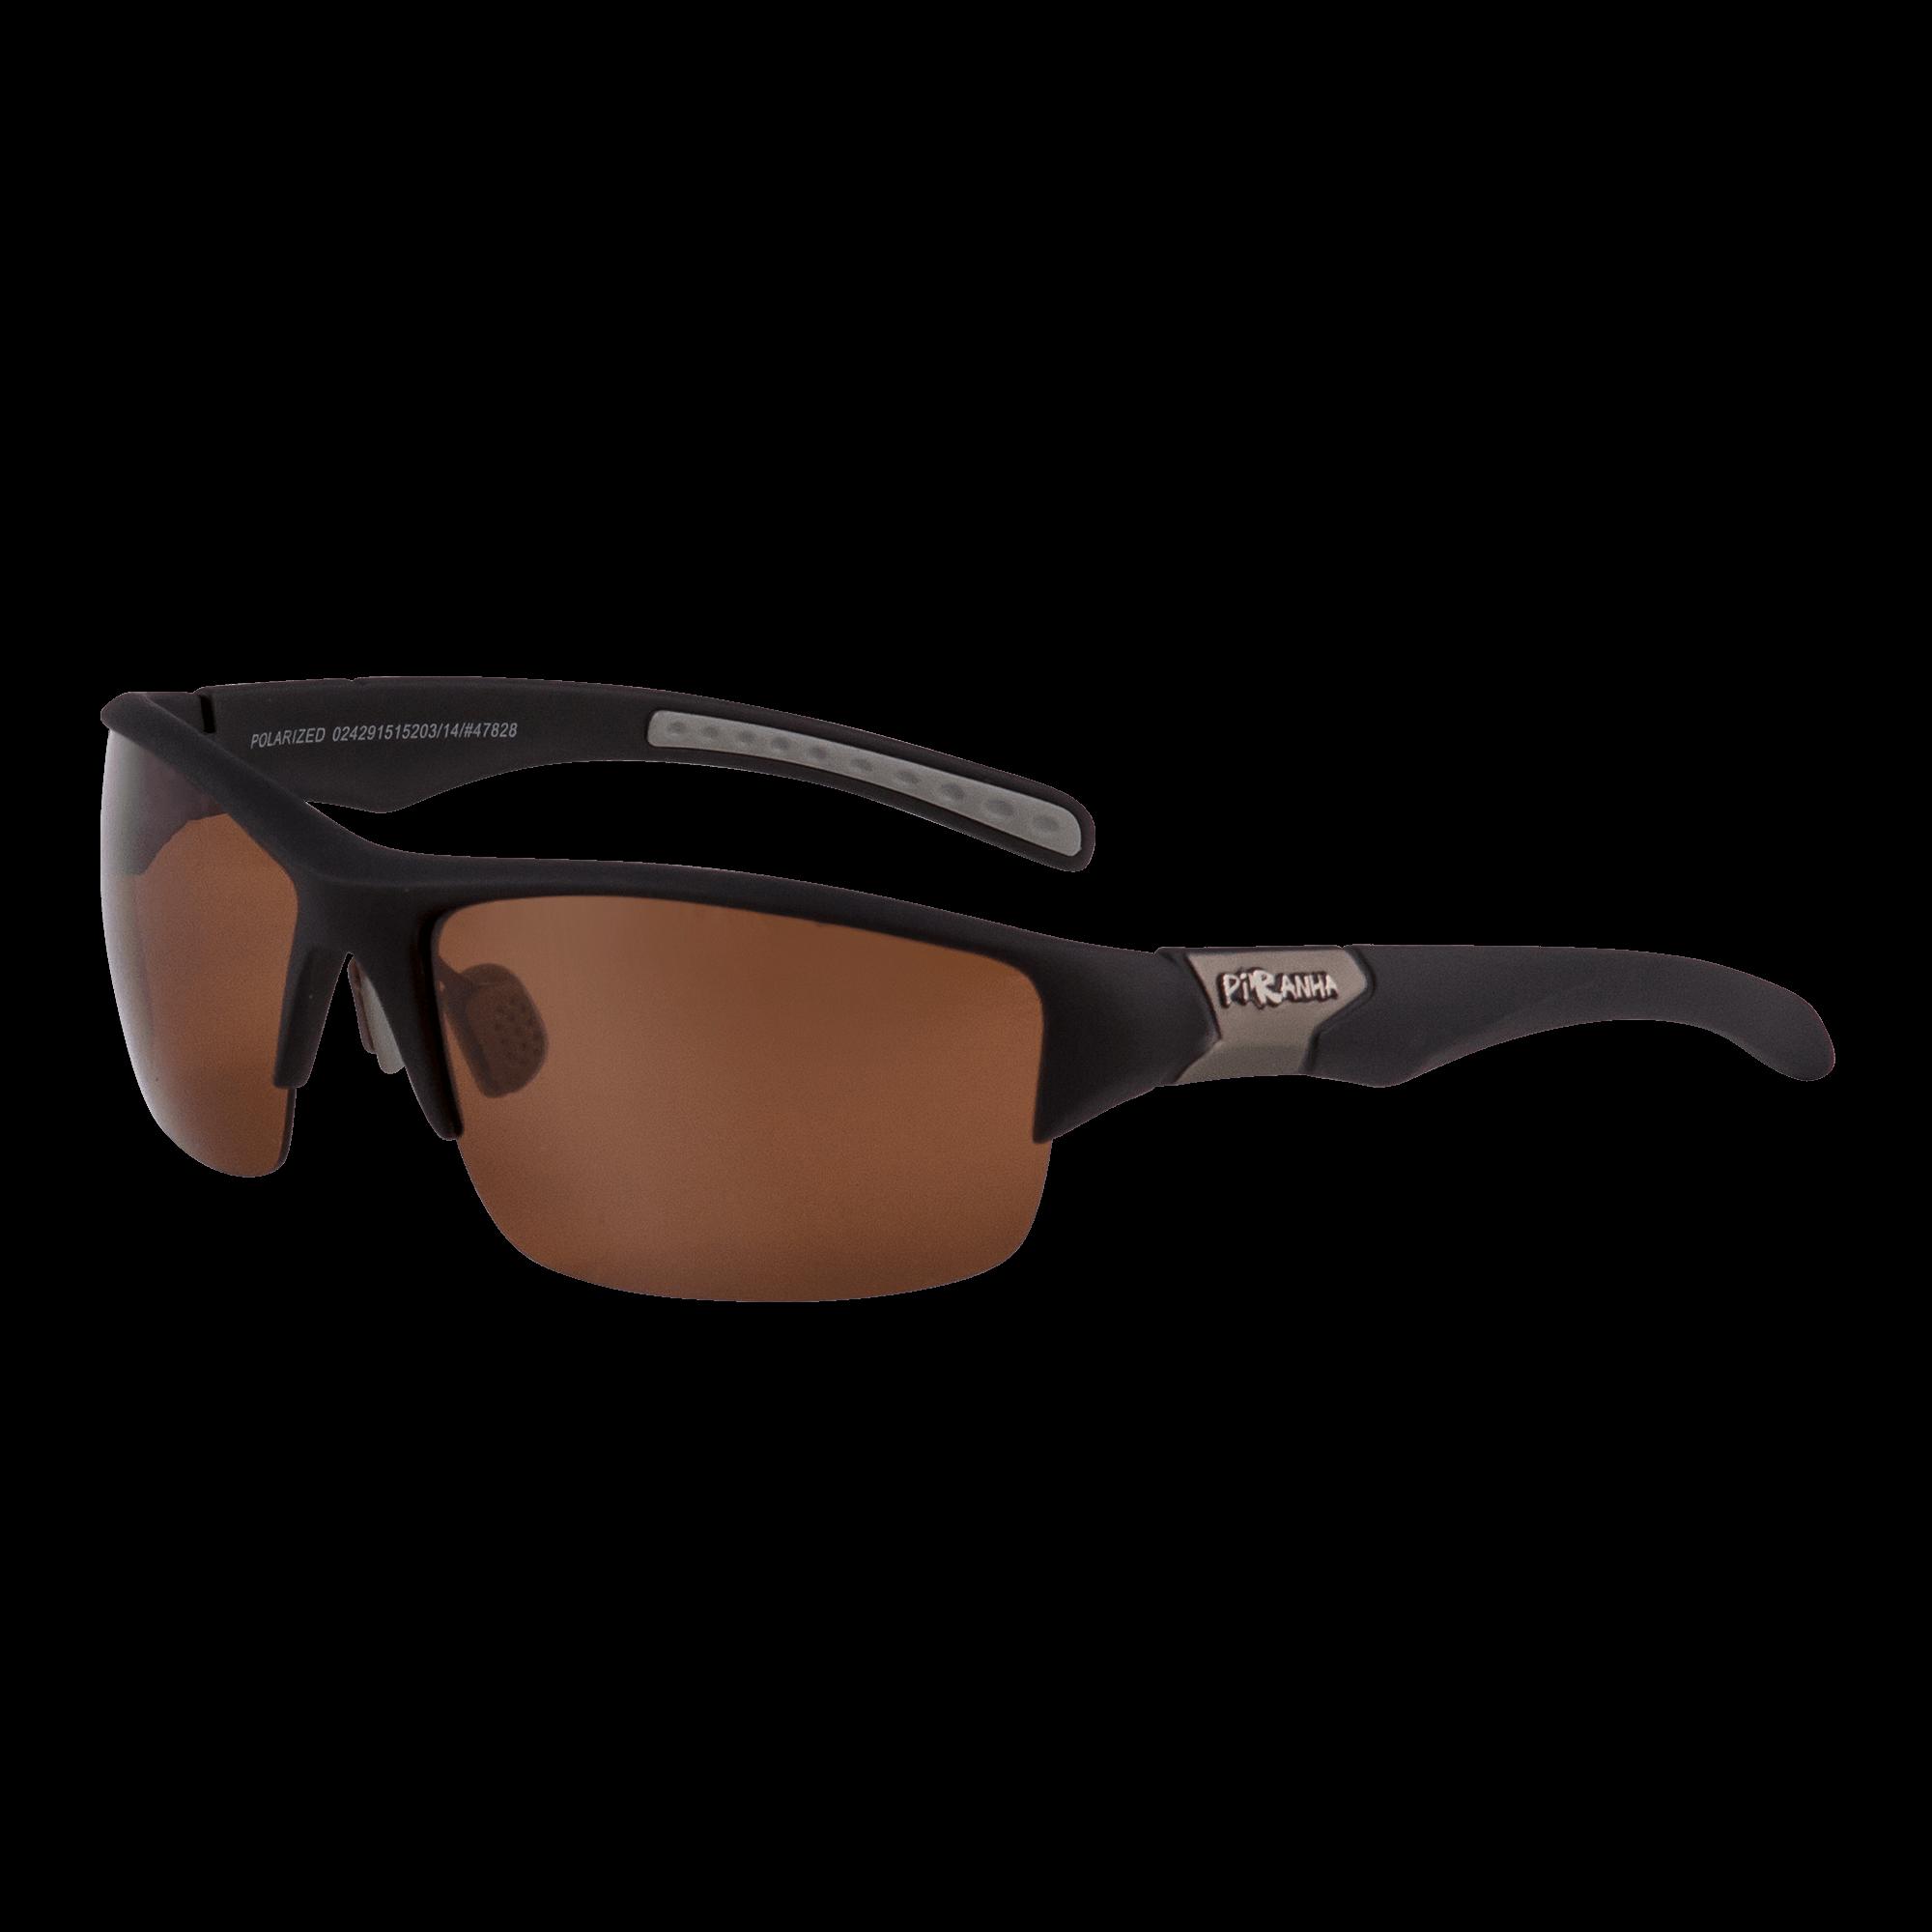 random 7 pack of piranha polarized sunglasses